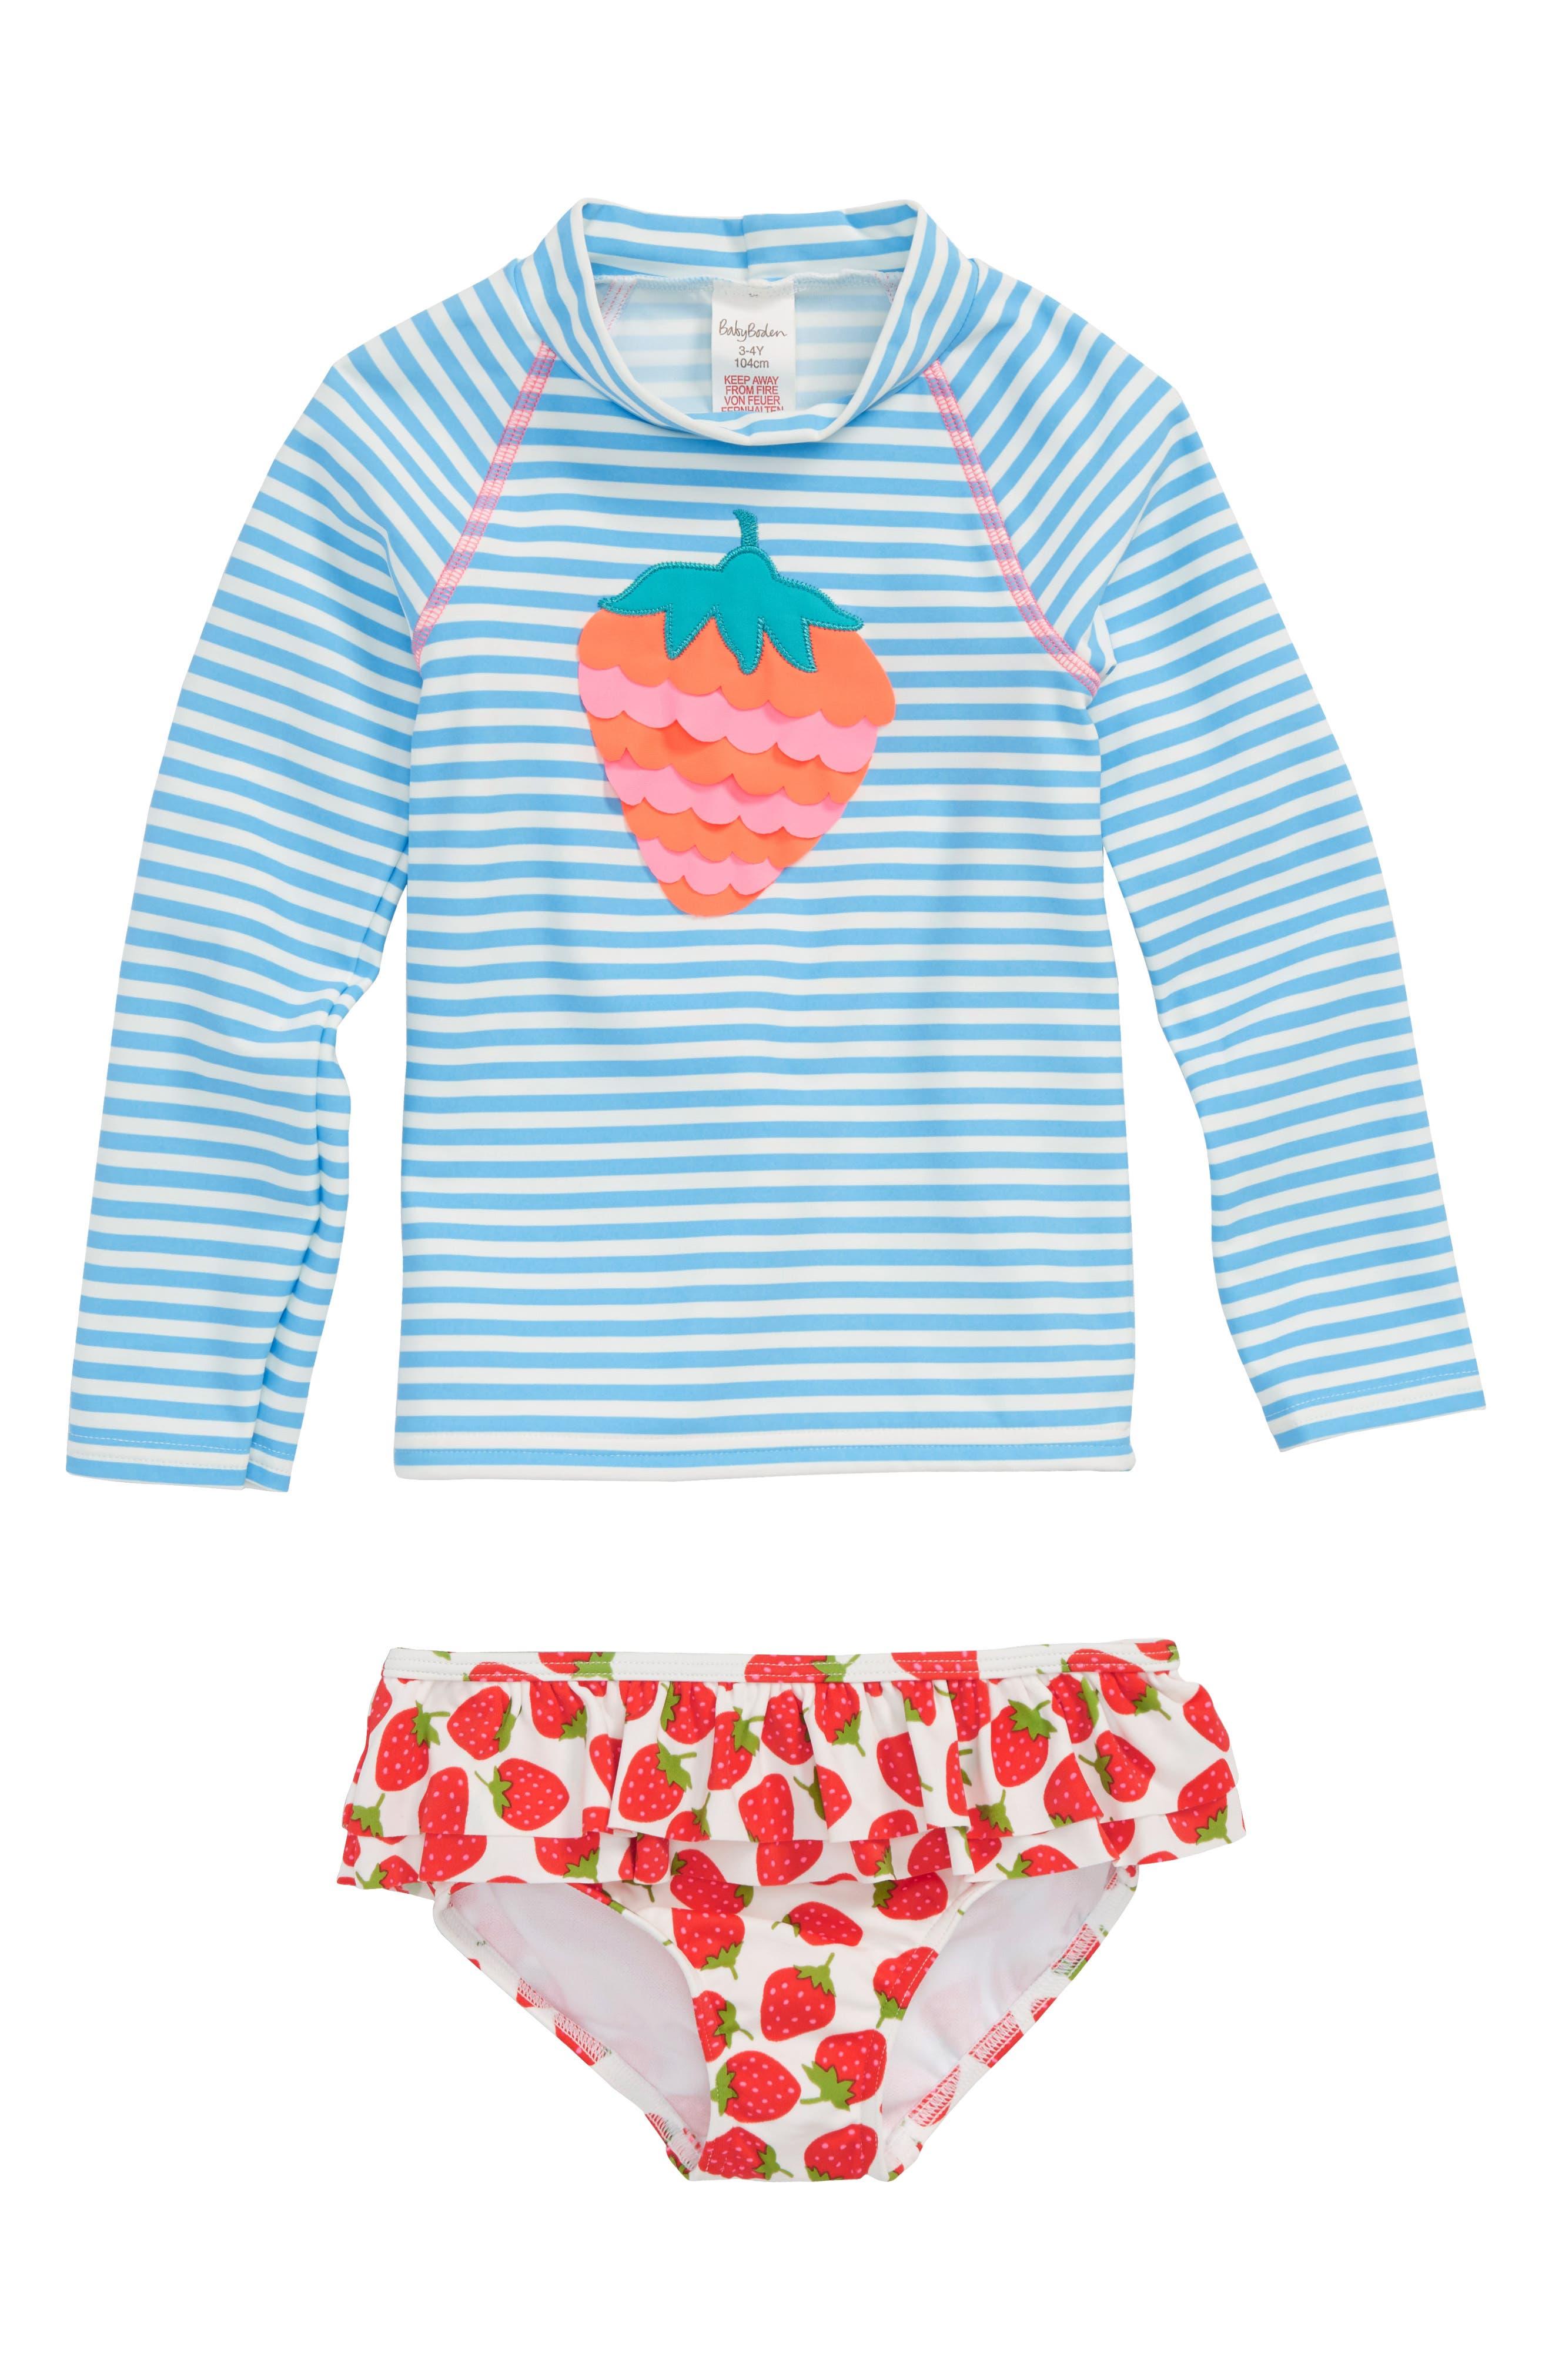 Two-Piece Rashguard Swimsuit,                         Main,                         color, Candy Blue/ Ivory Stripe